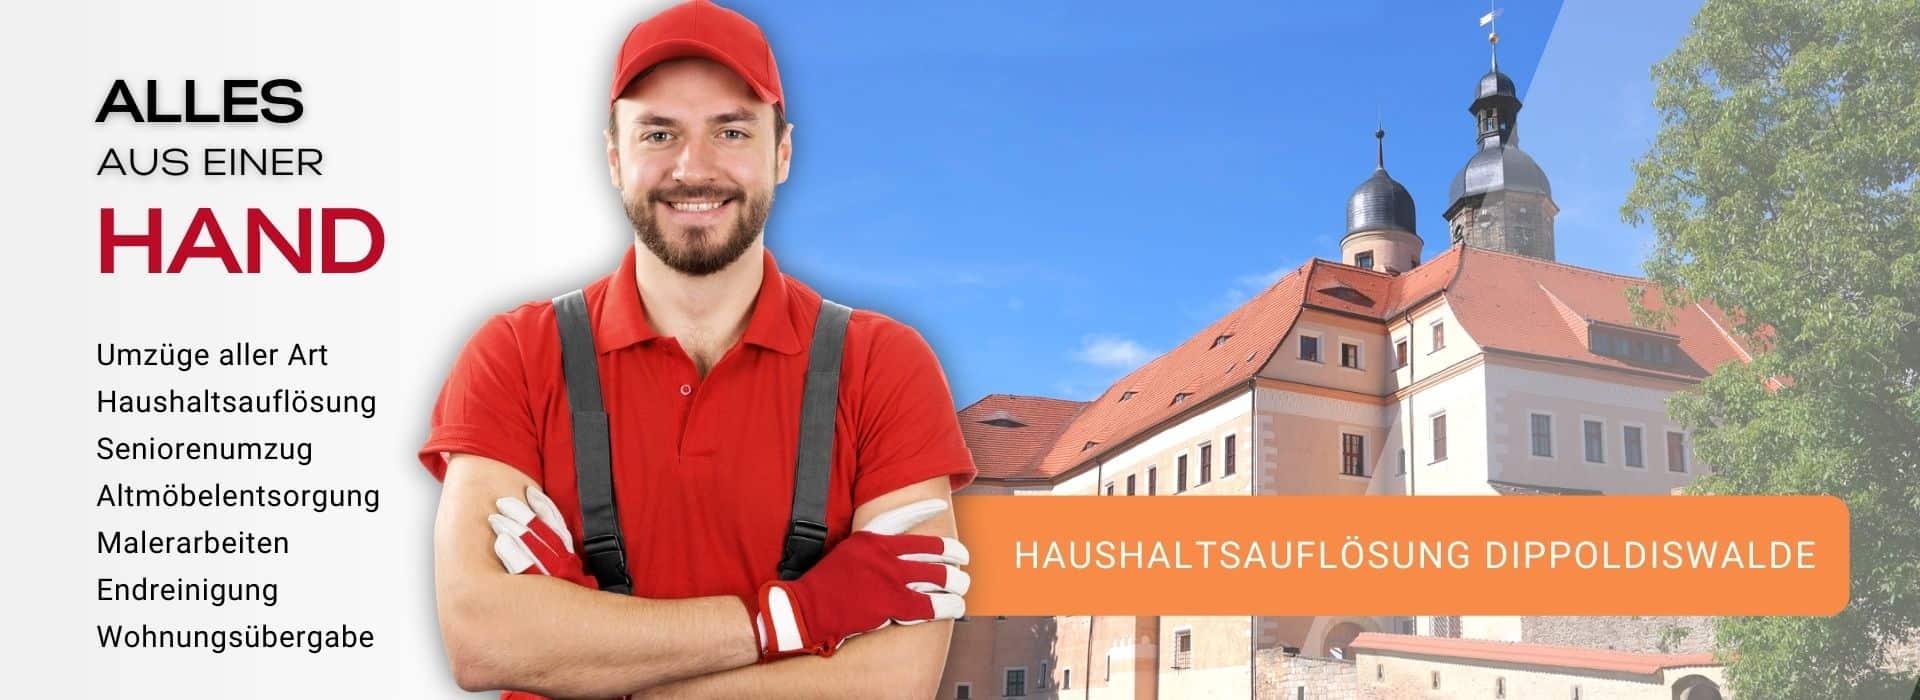 Haushaltsauflösung Dippoldiswalde Entrümpelung